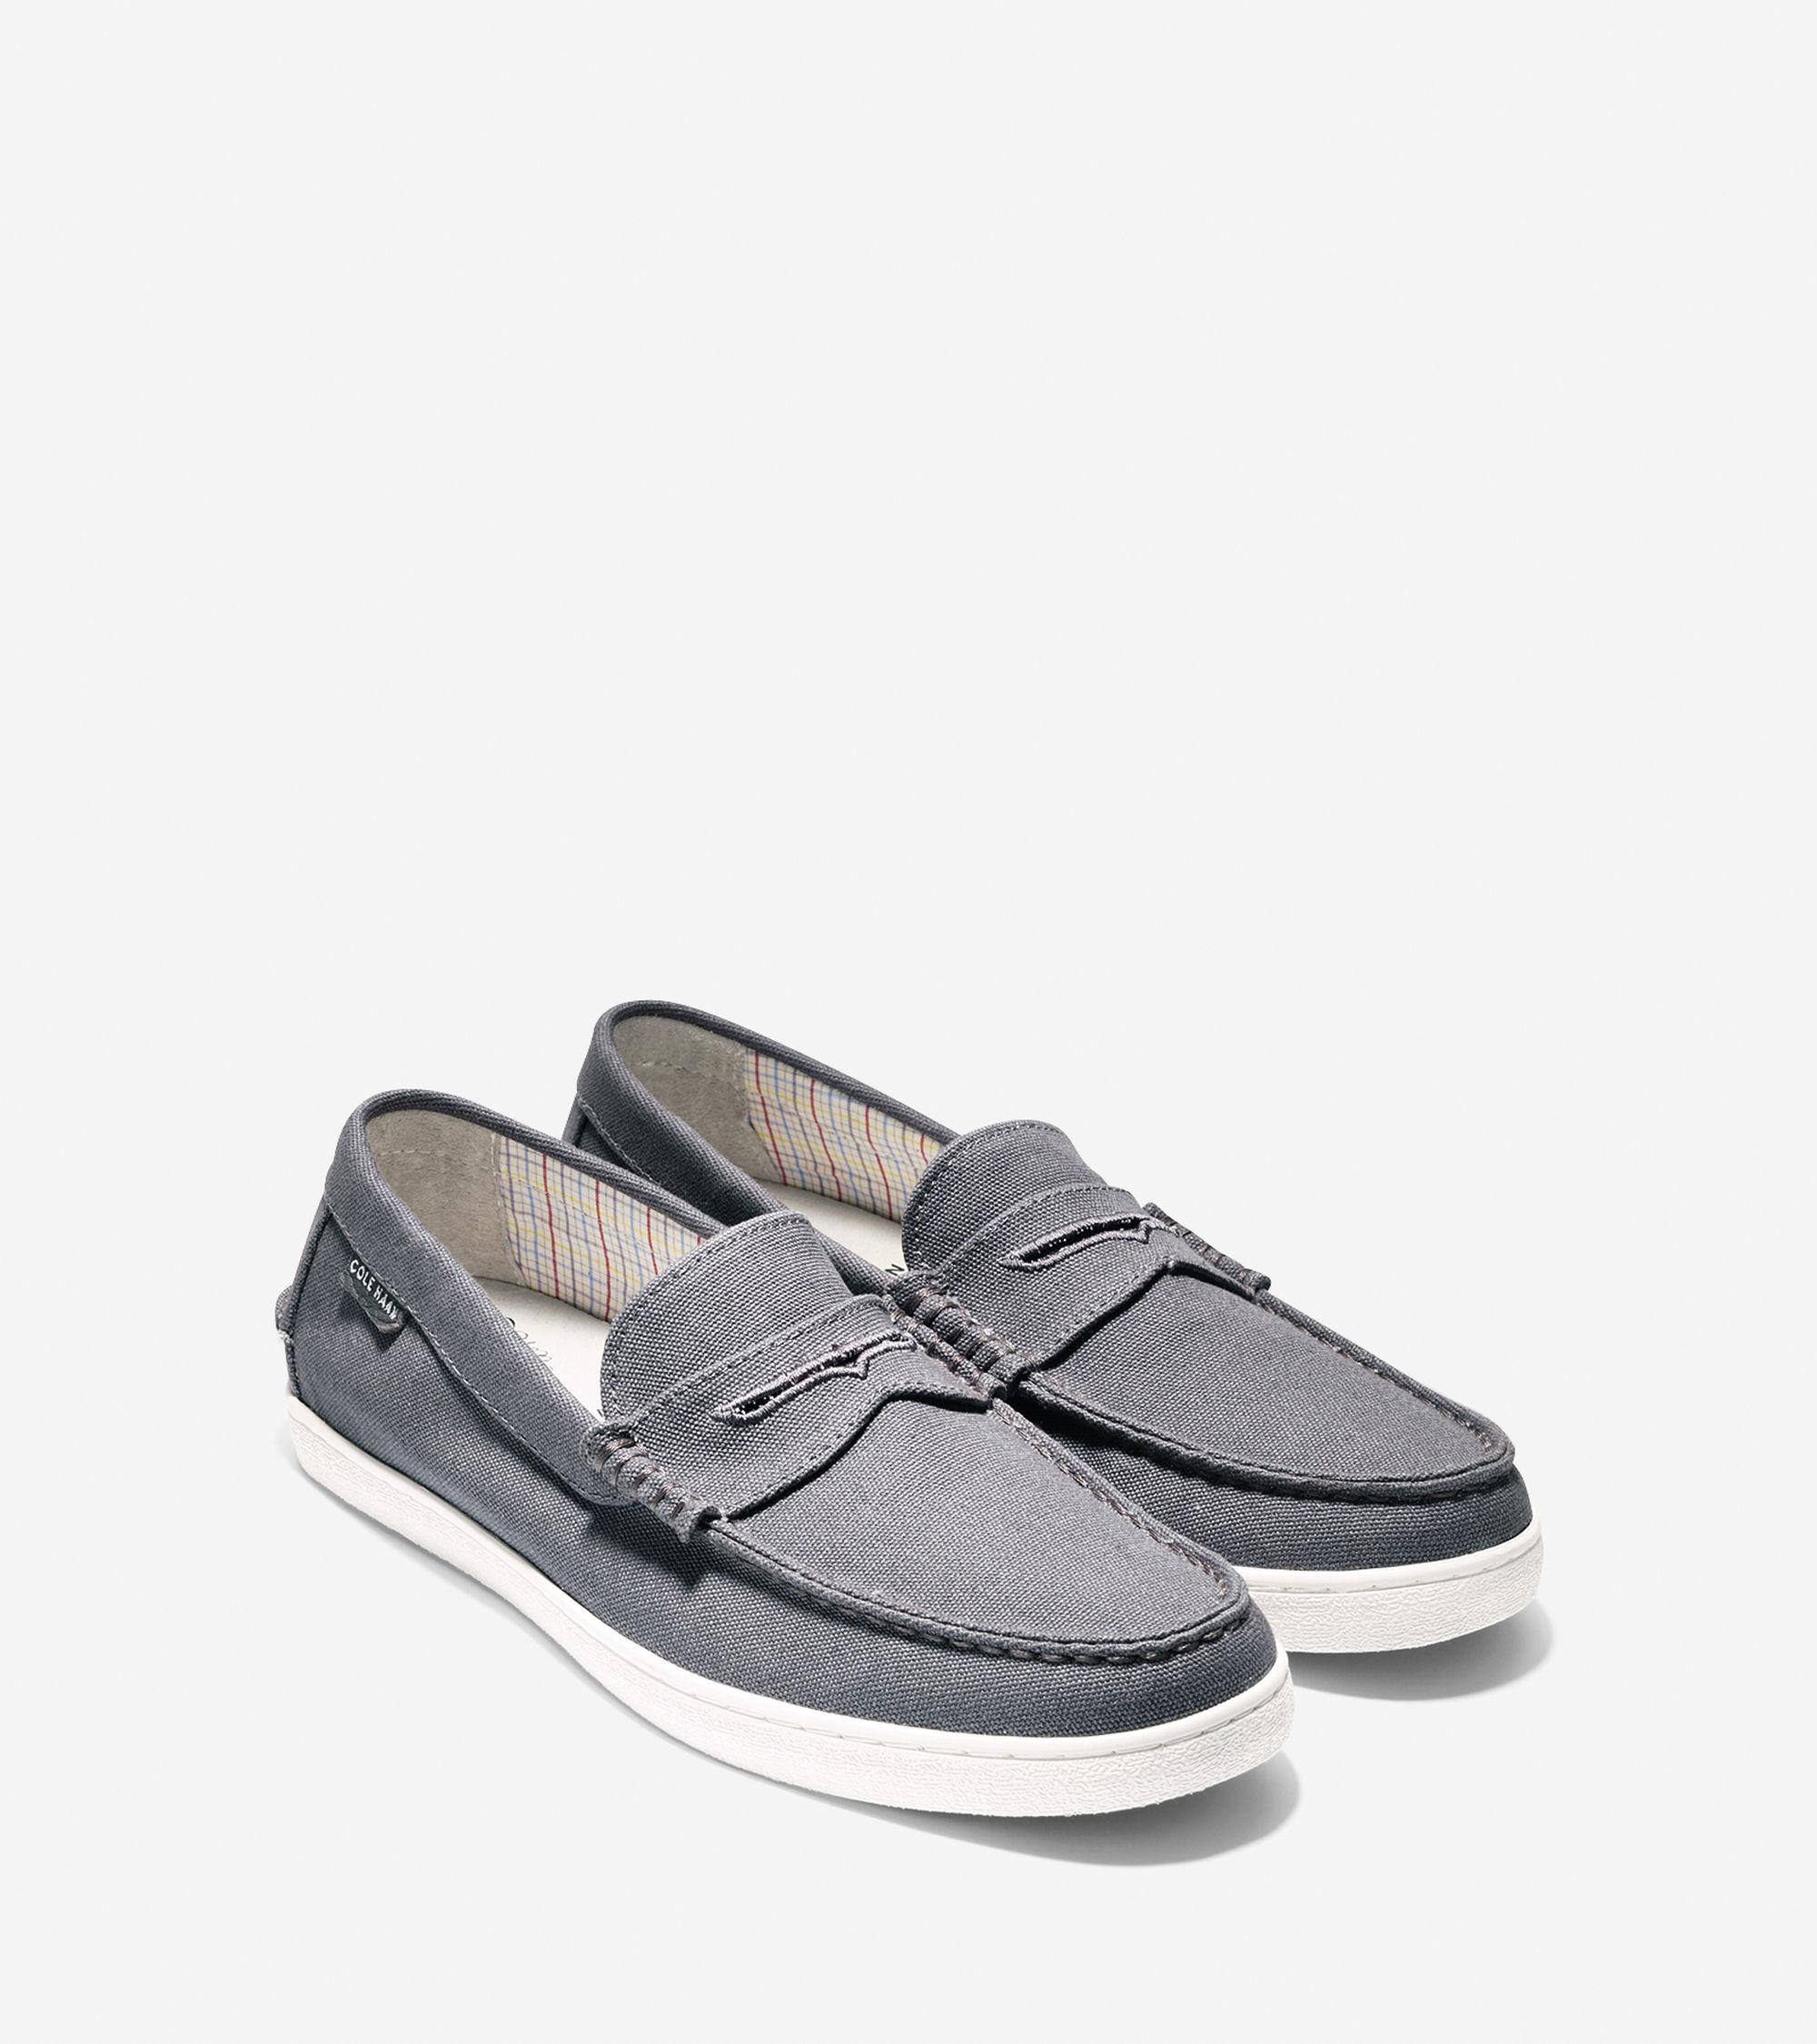 Mens Canvas Slip On Shoes Australia